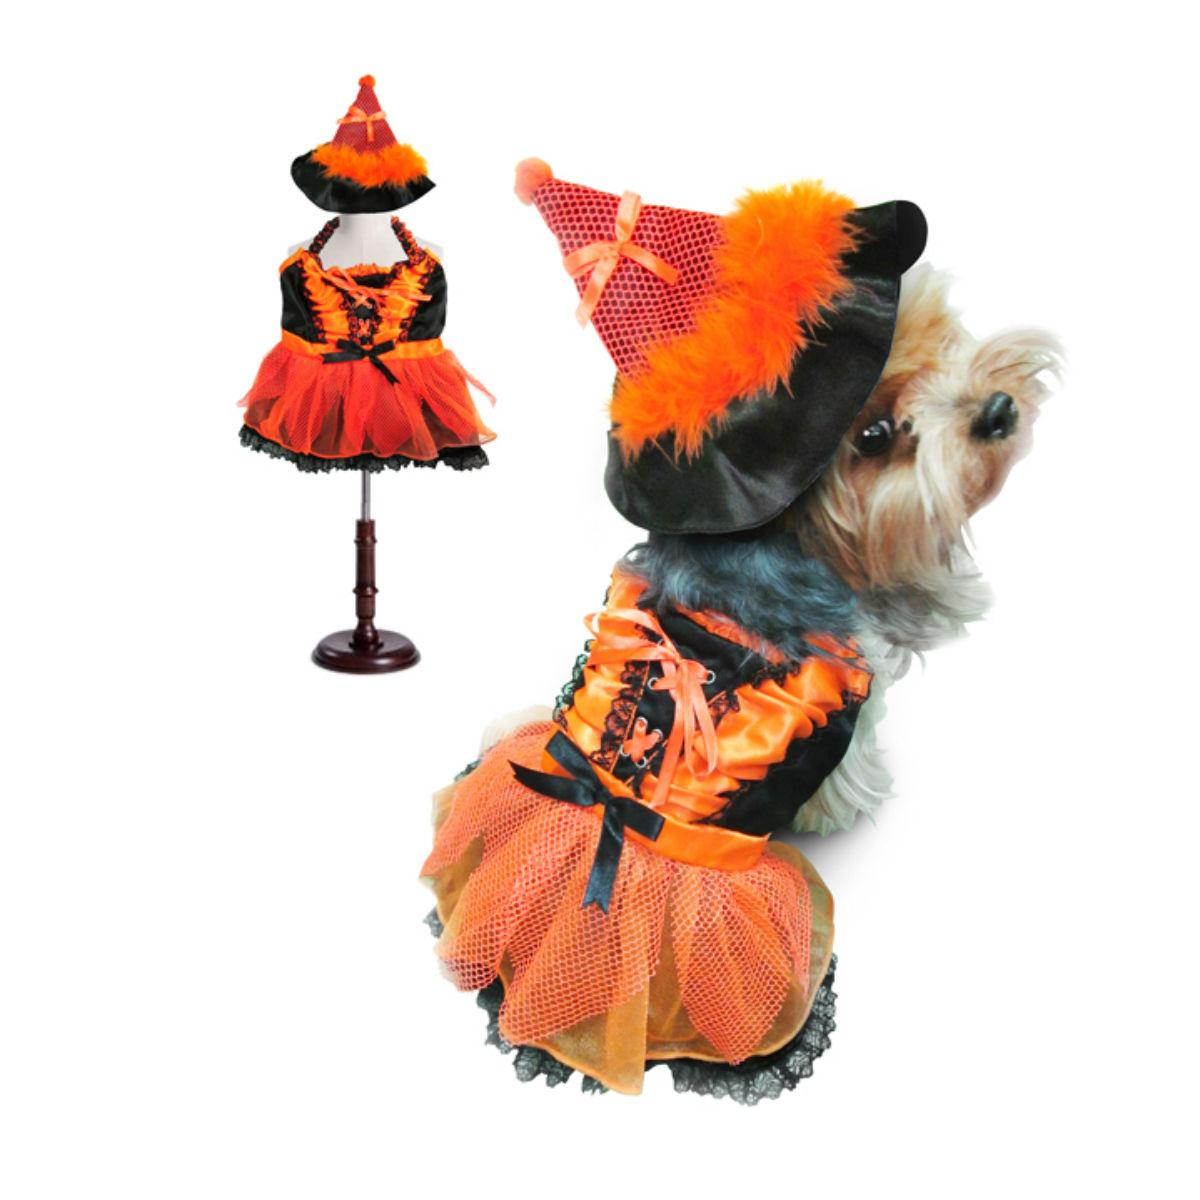 Witch Dog Halloween Costume - Orange and Black